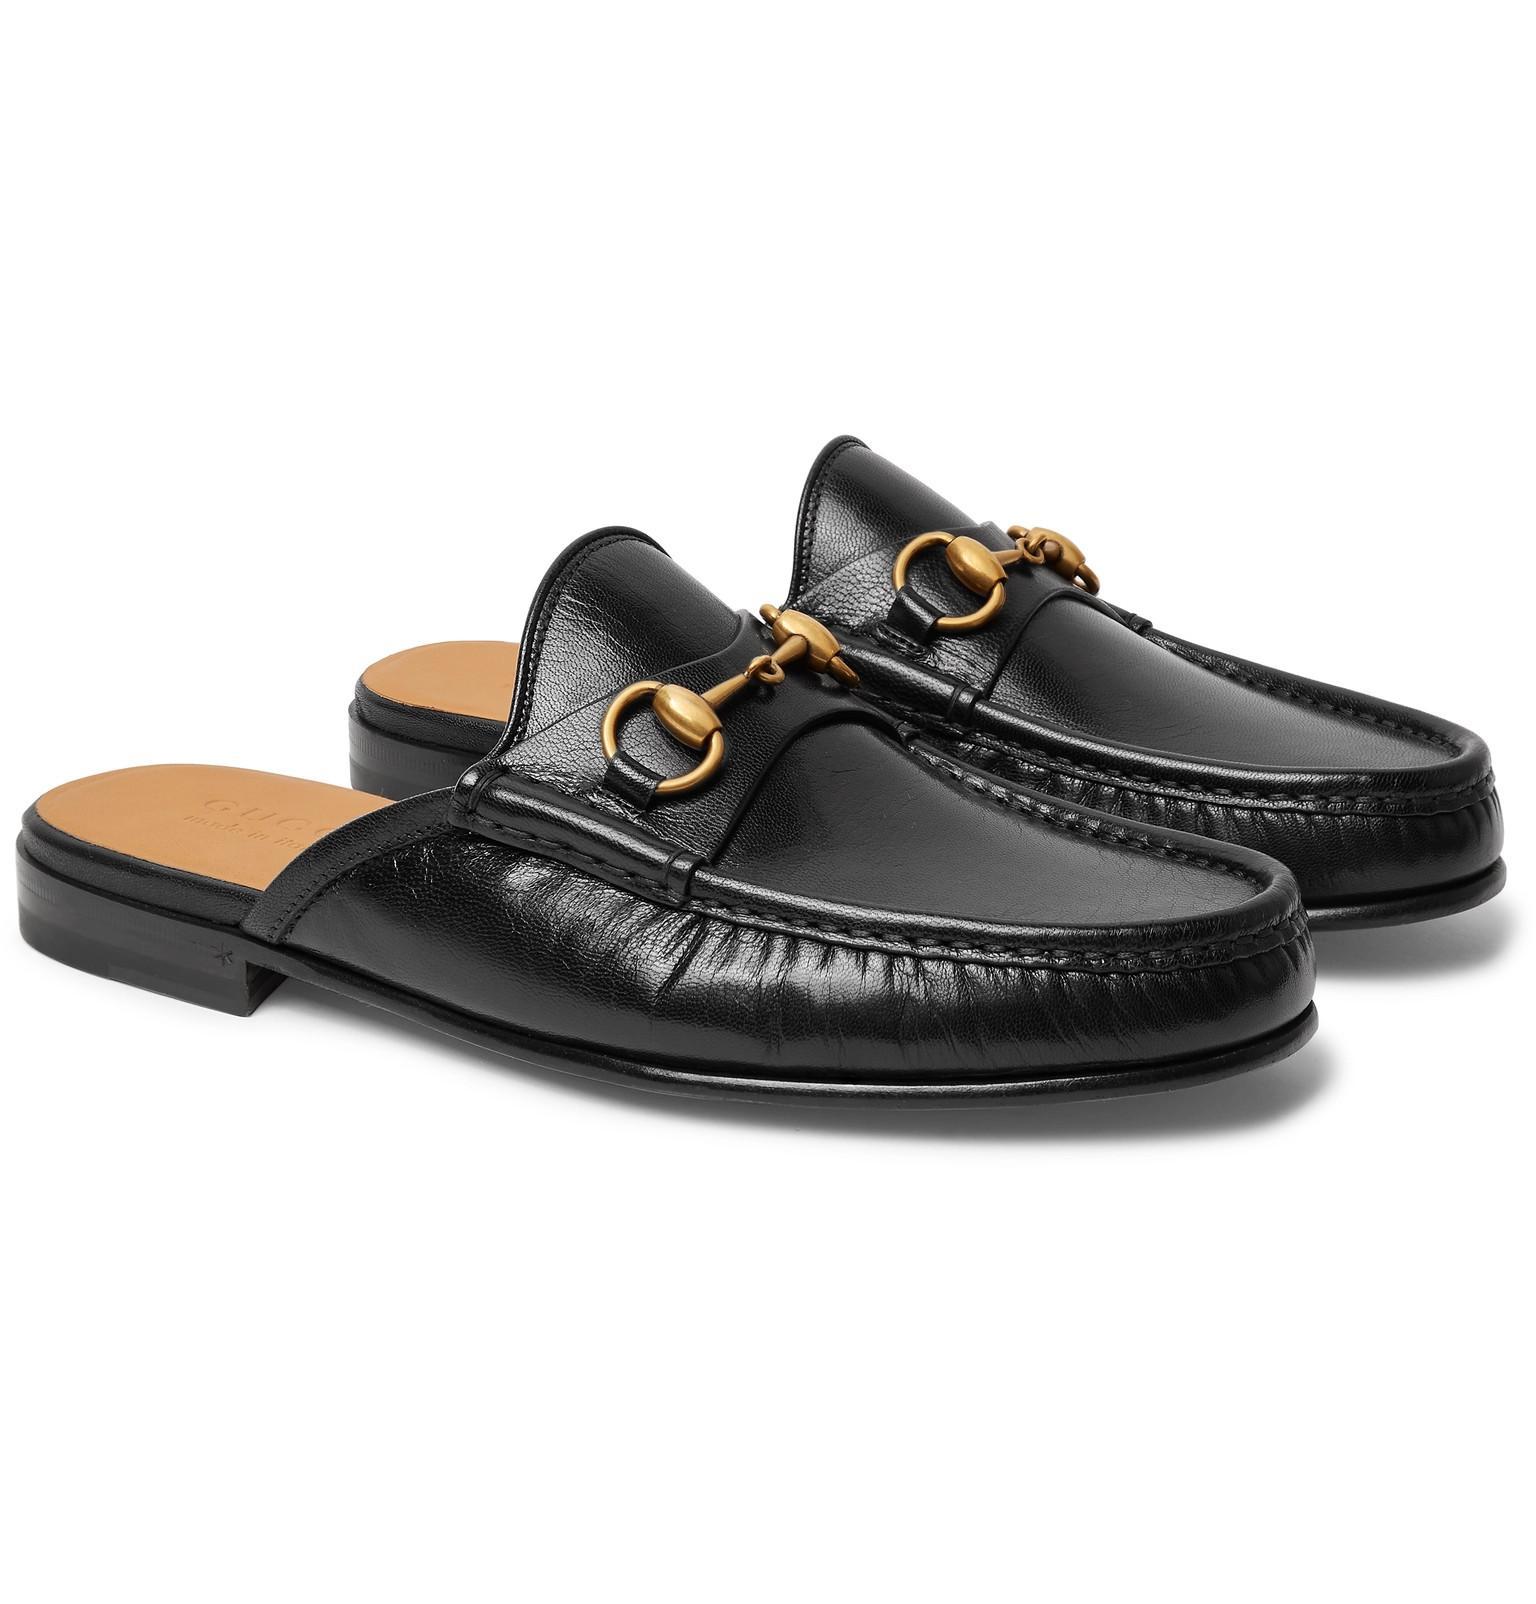 Gucci Leather Horsebit Slipper in Black